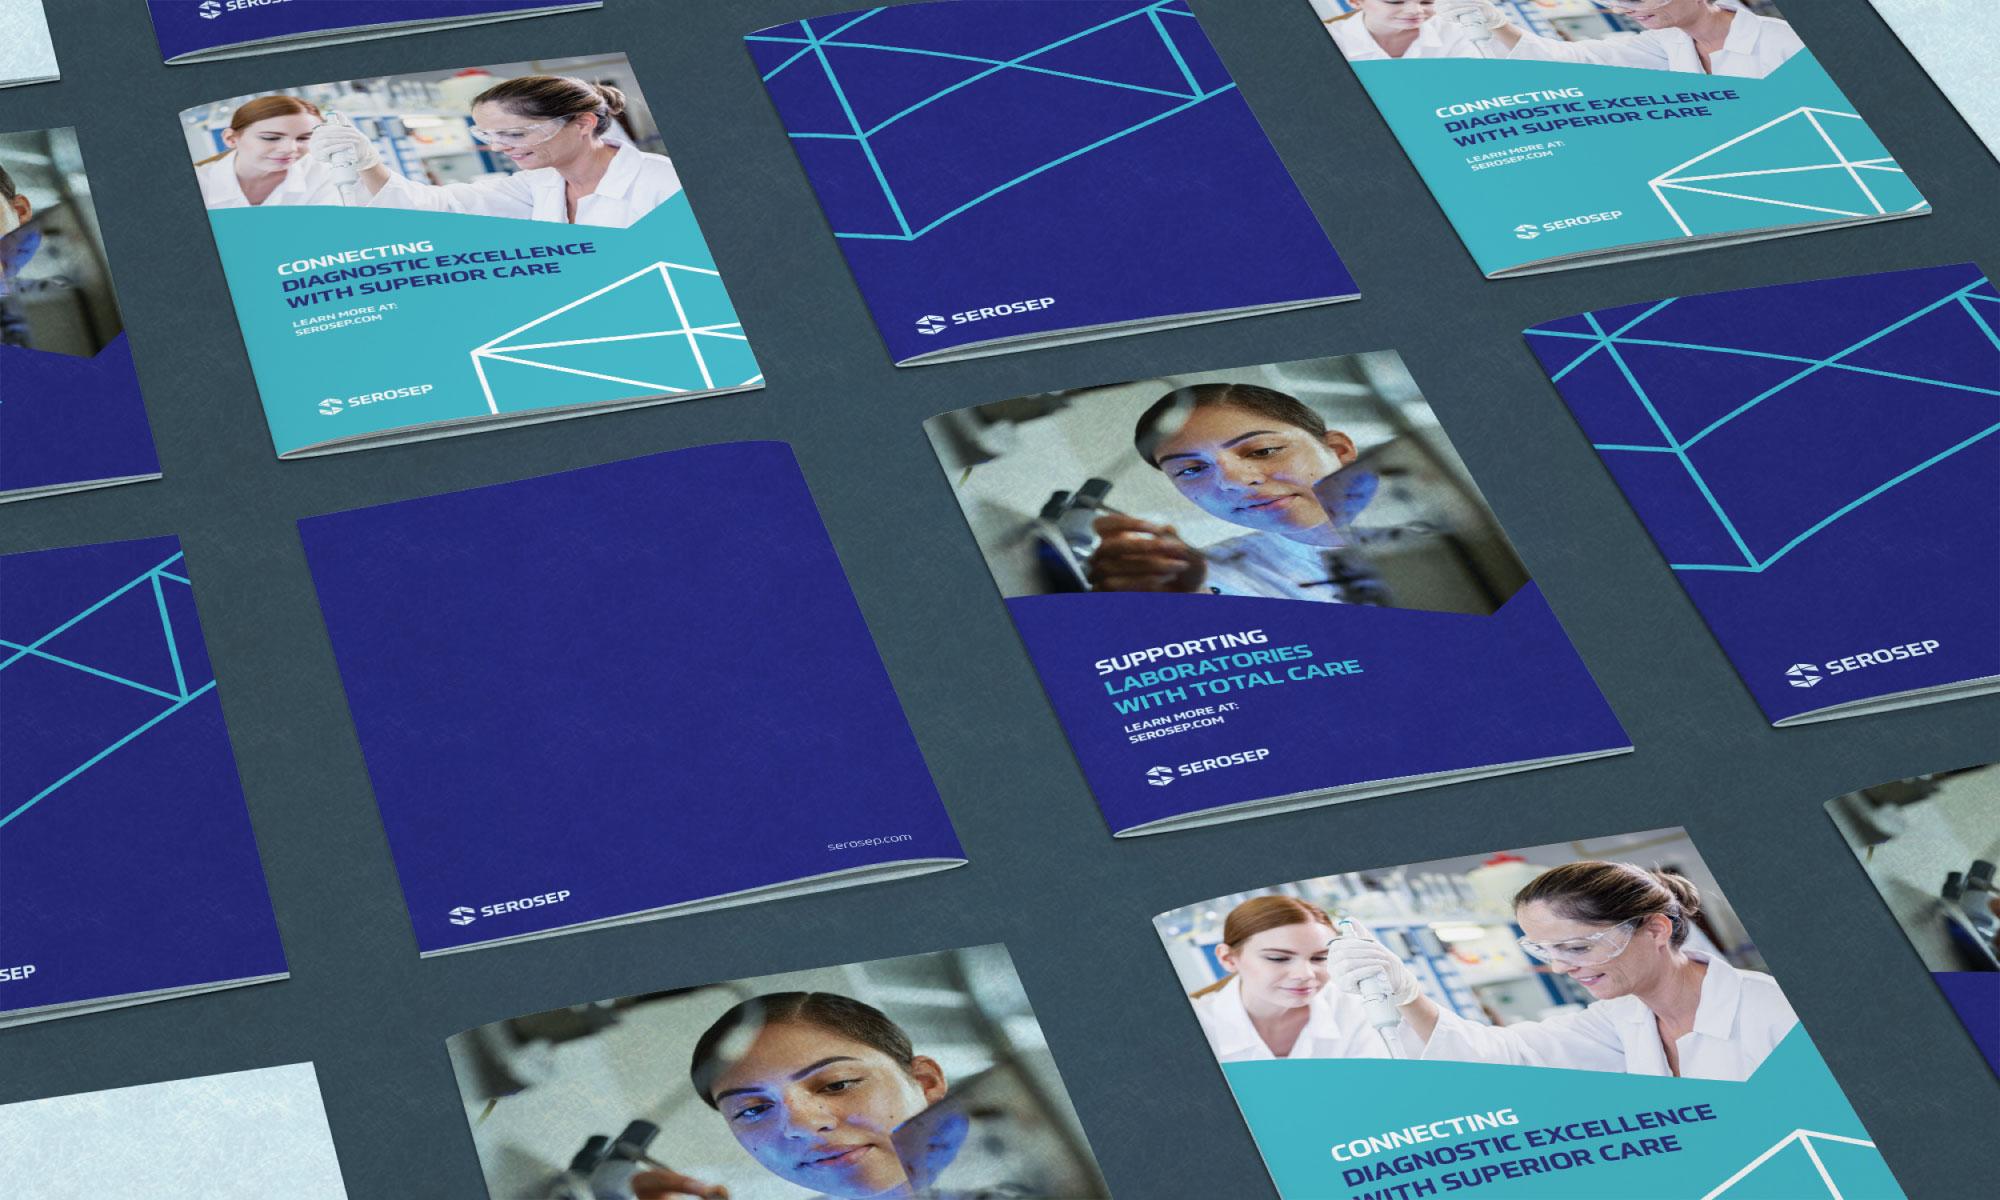 DW_Serosep_Brochures